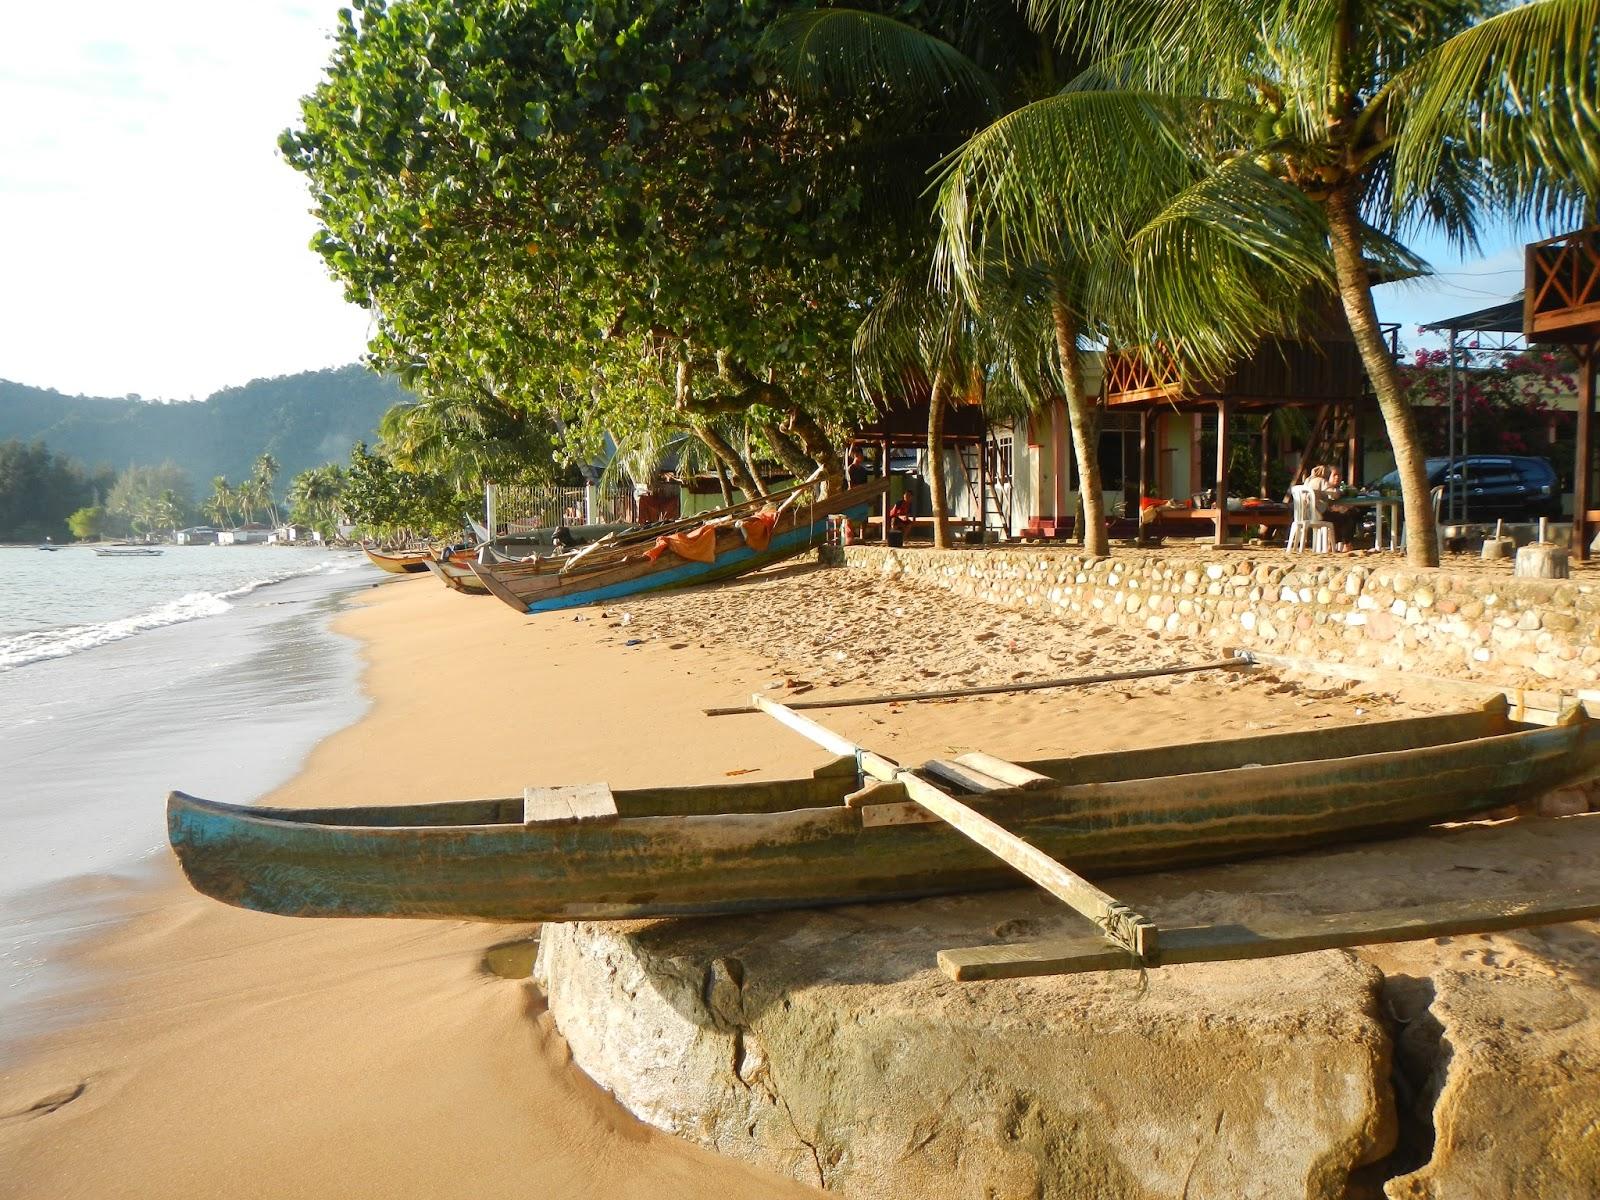 pantai bungus sumatera barat - 5 Tempat Wisata Eksotis di Sumatera Barat